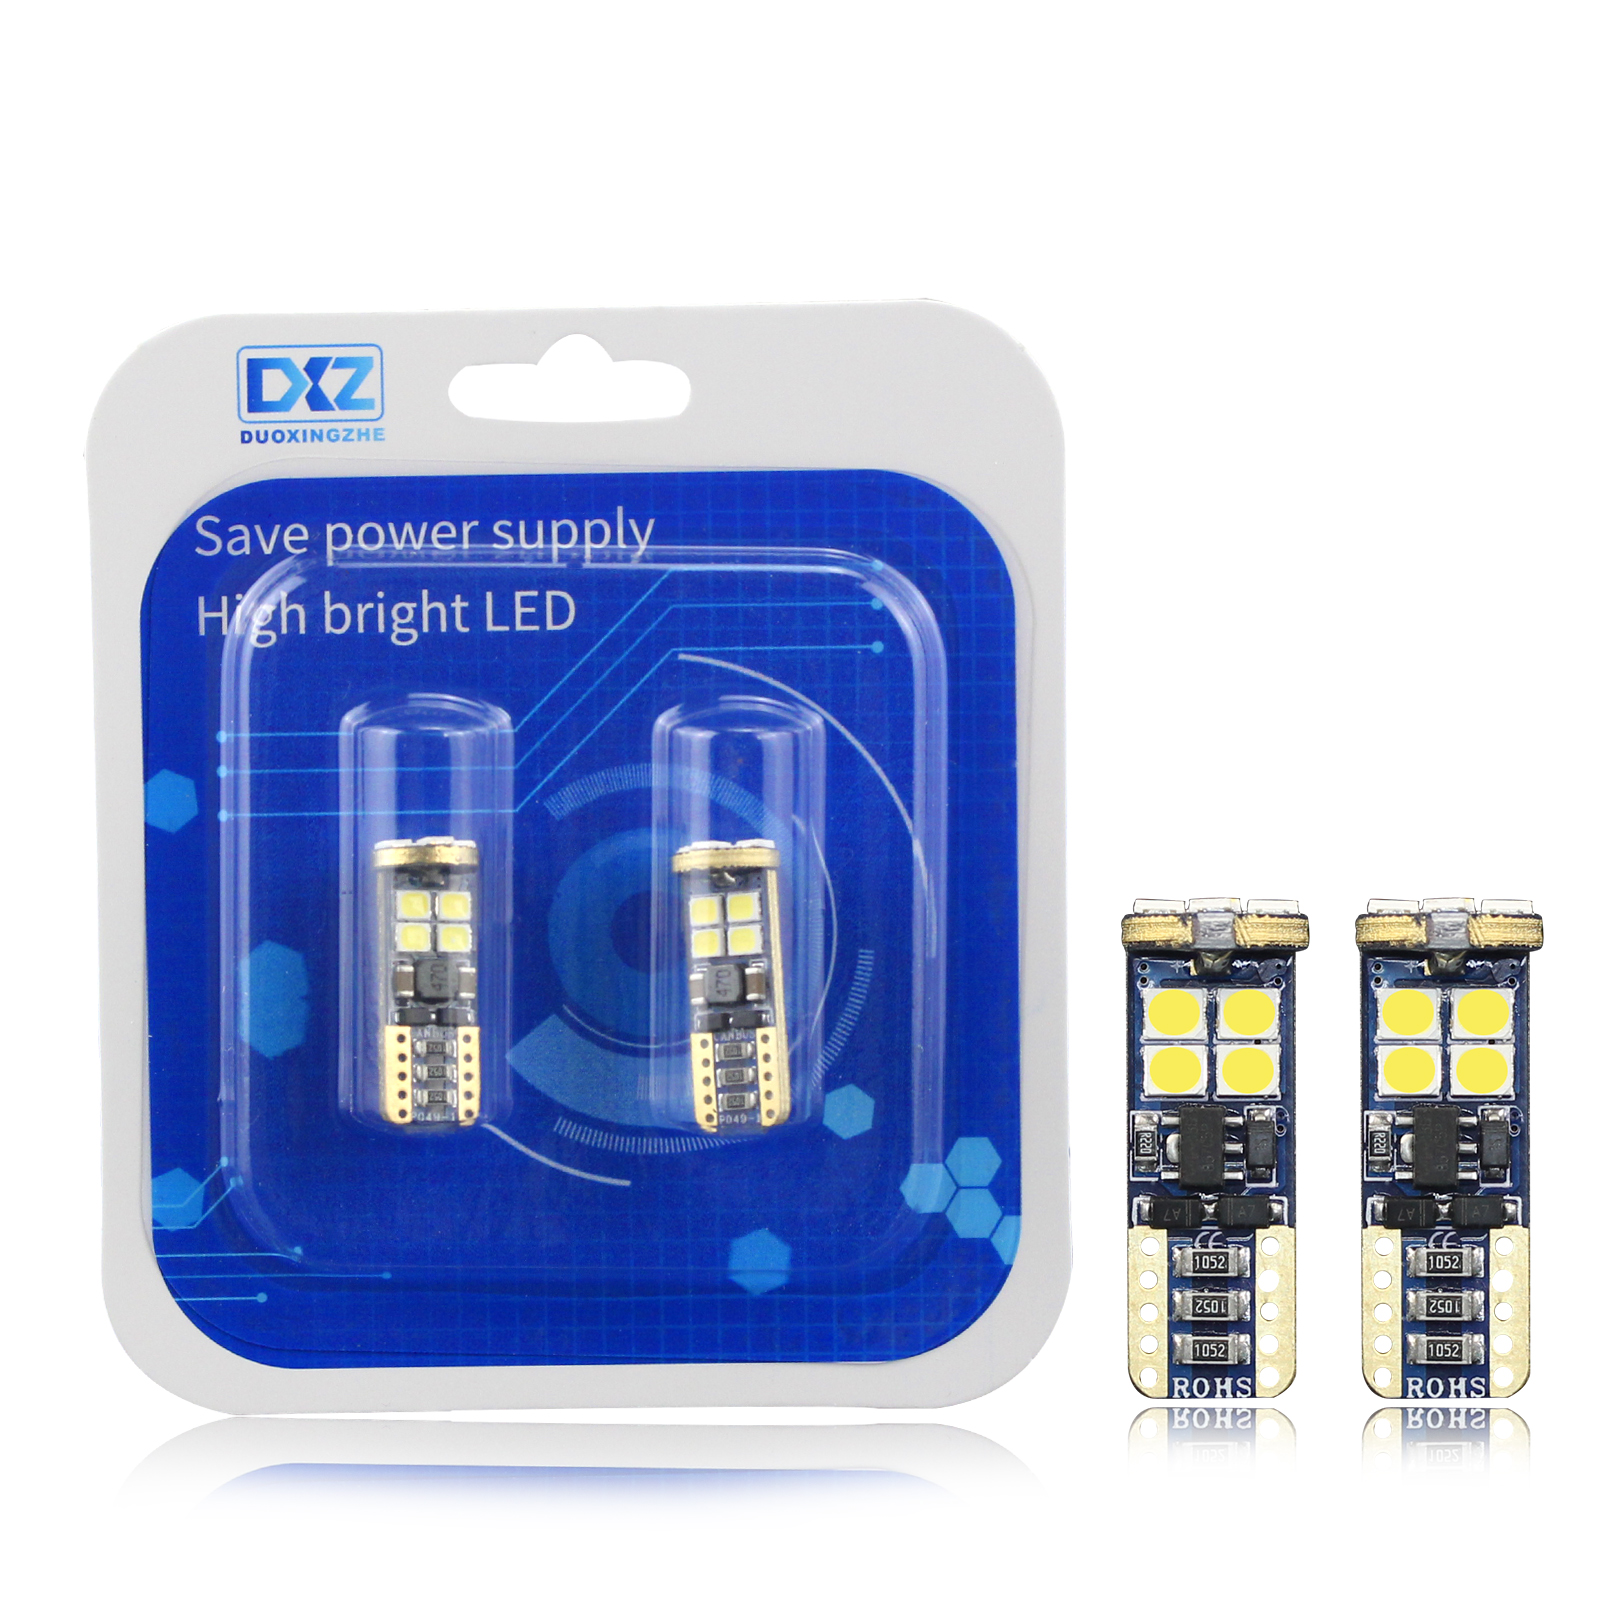 DXZ 2Pcs High quality T10 CANBUS 12SMD 3030 LED White Car Side Tail Light Bulb t10 canbus Error Free w5w 194 168 led styling